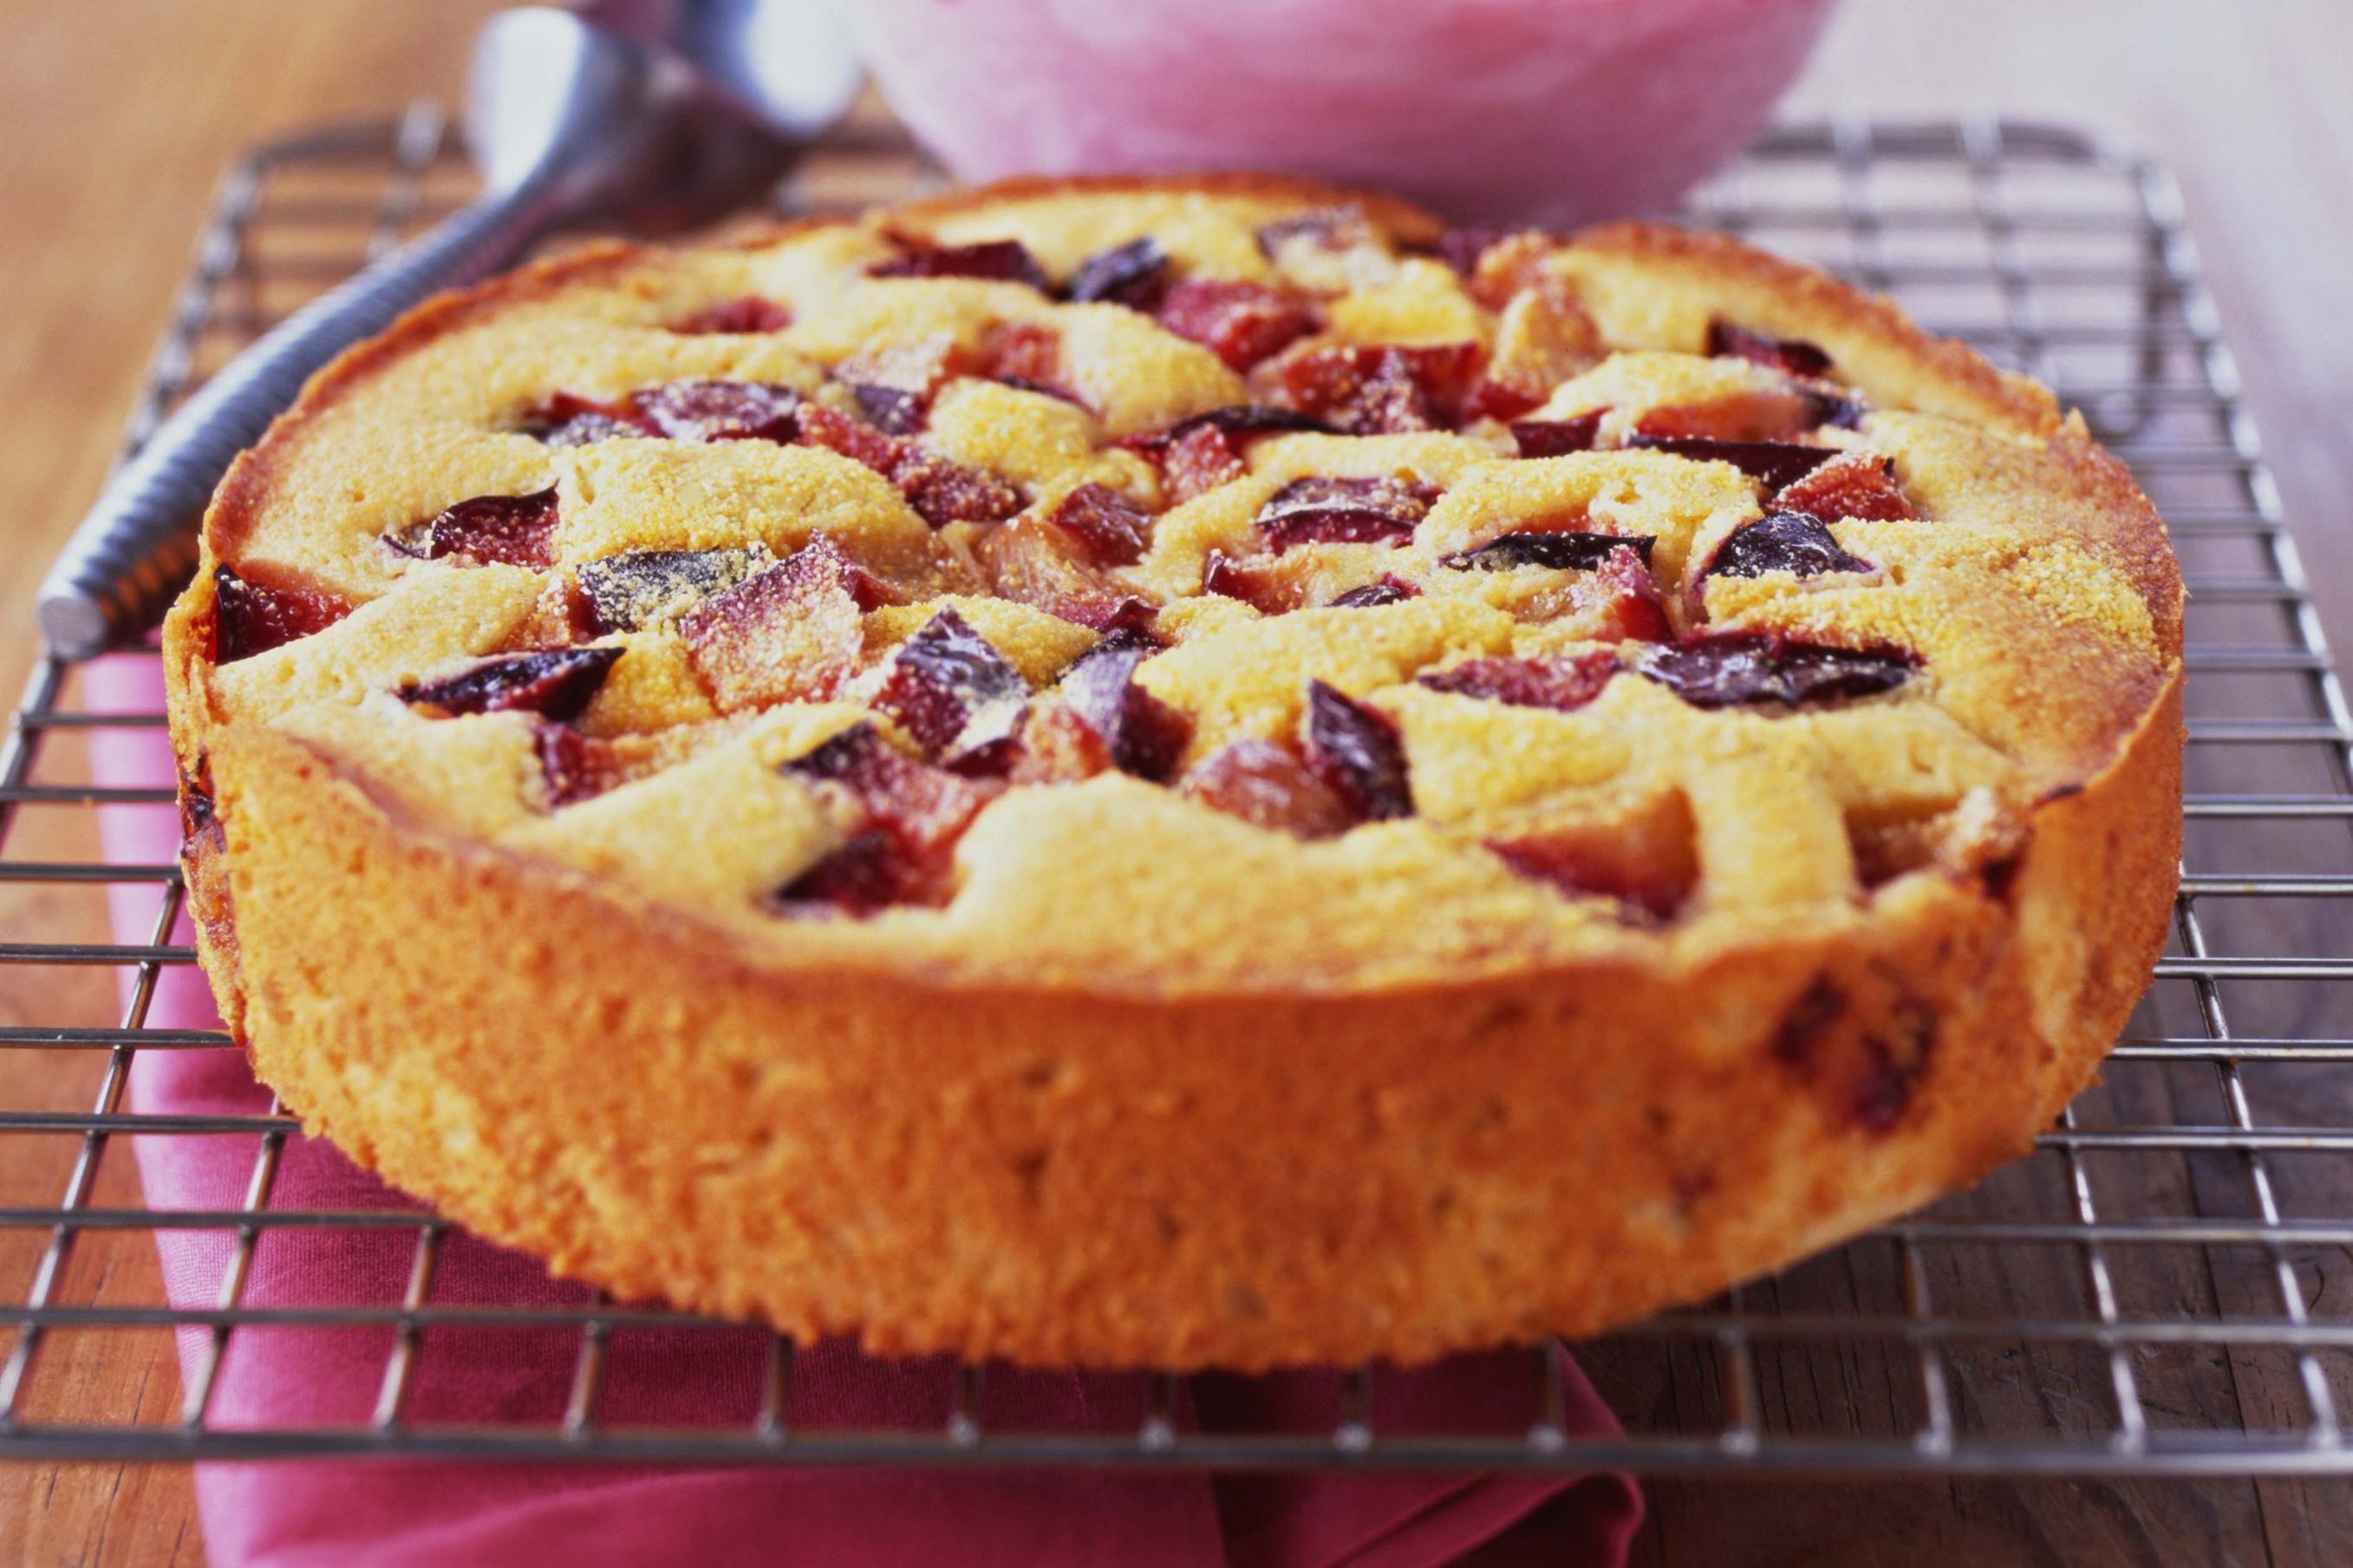 Polish Cake Recipes Uk: Polish Plum Cake (Placek Z Sliwkami)